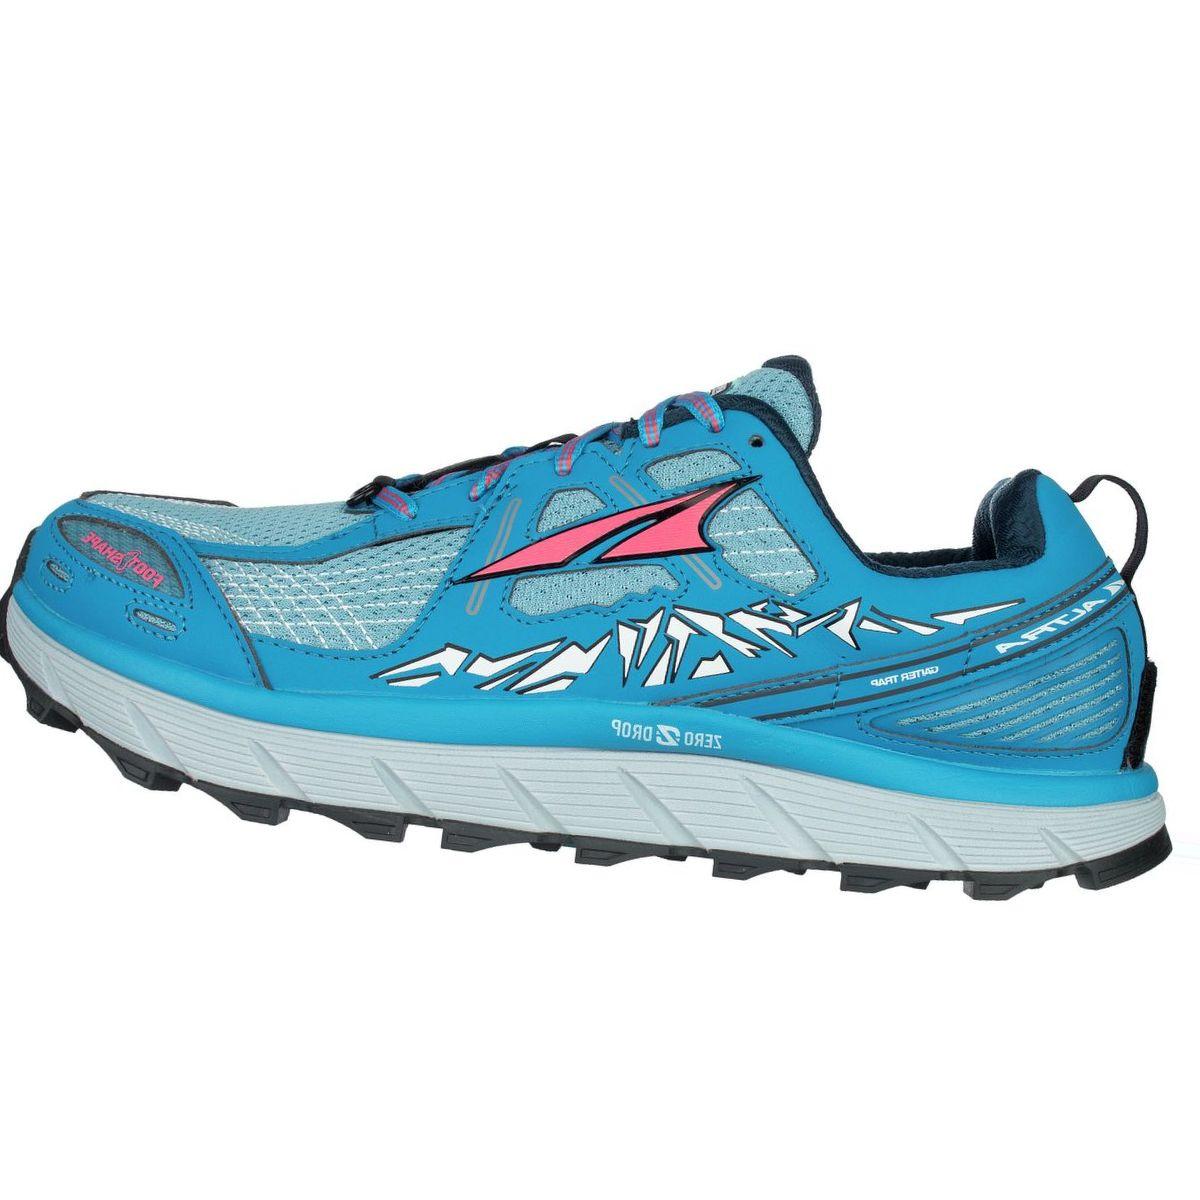 Altra Lone Peak 3.5 Trail Running Shoe - Women's